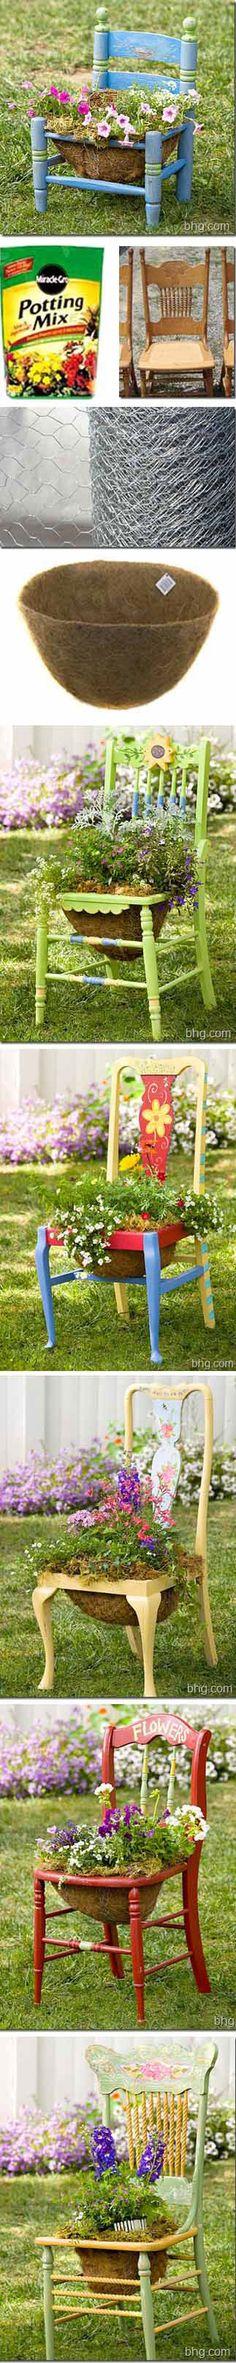 Chair planters...love